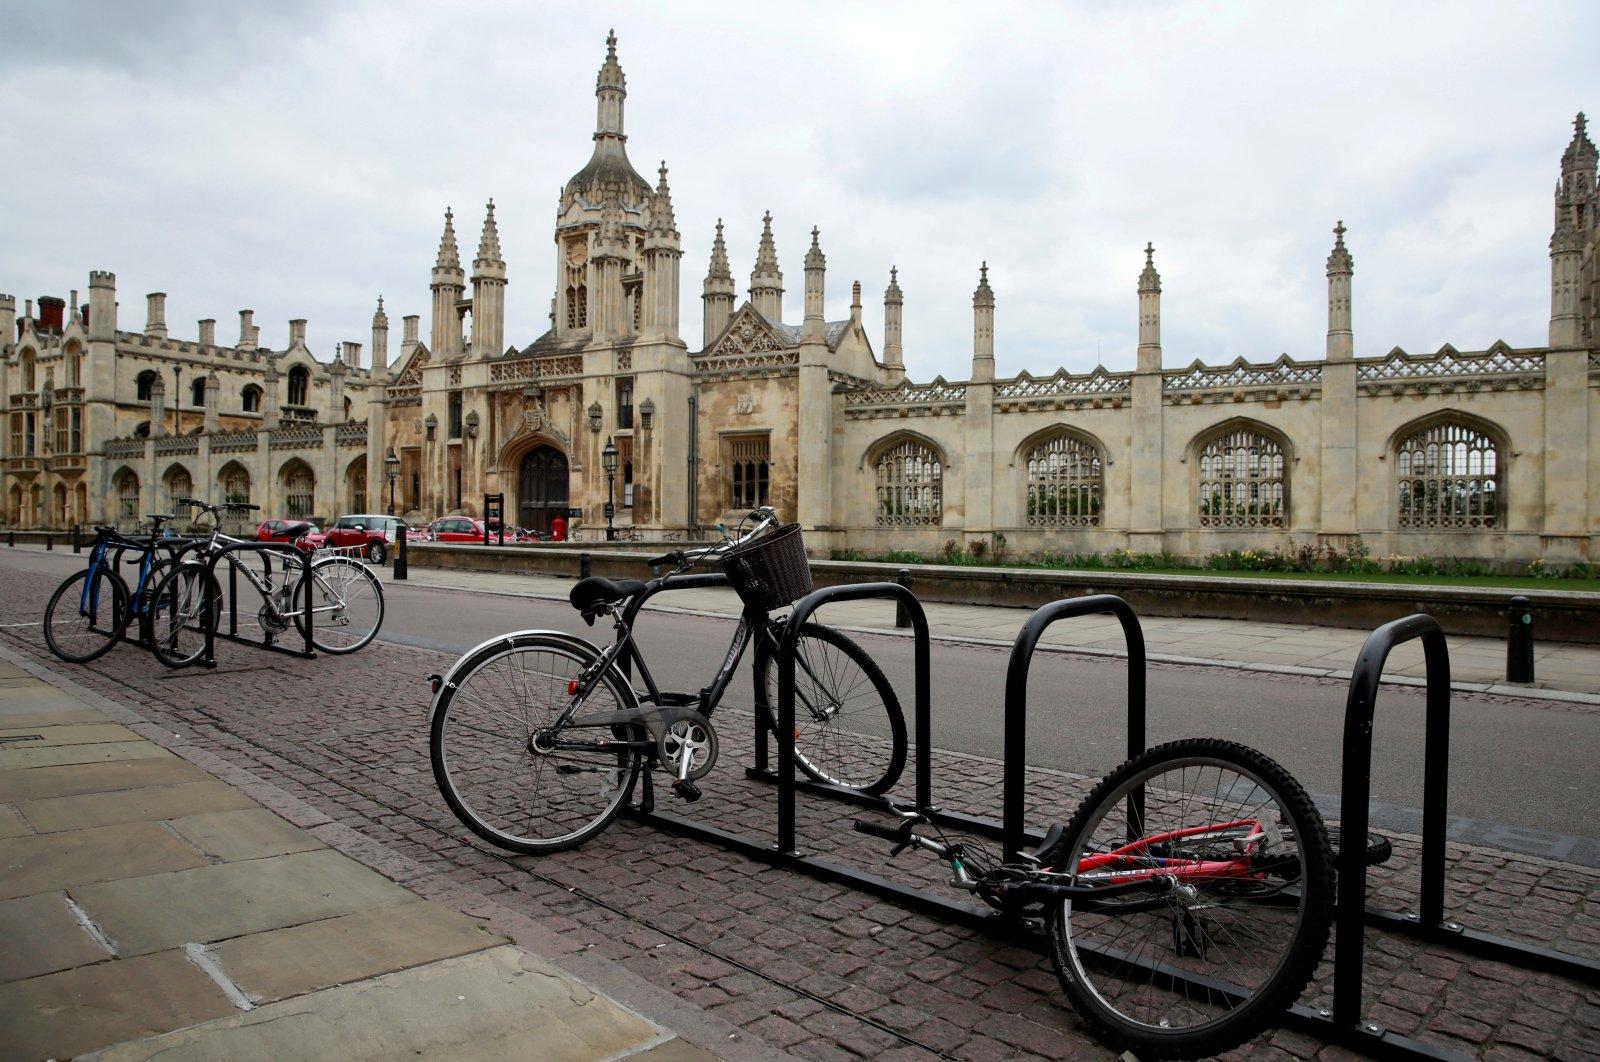 Bikes are seen outside Cambridge University, as the spread of the coronavirus disease (COVID-19) continues, Cambridge, Britain, April 1, 2020. (Reuters Photo)